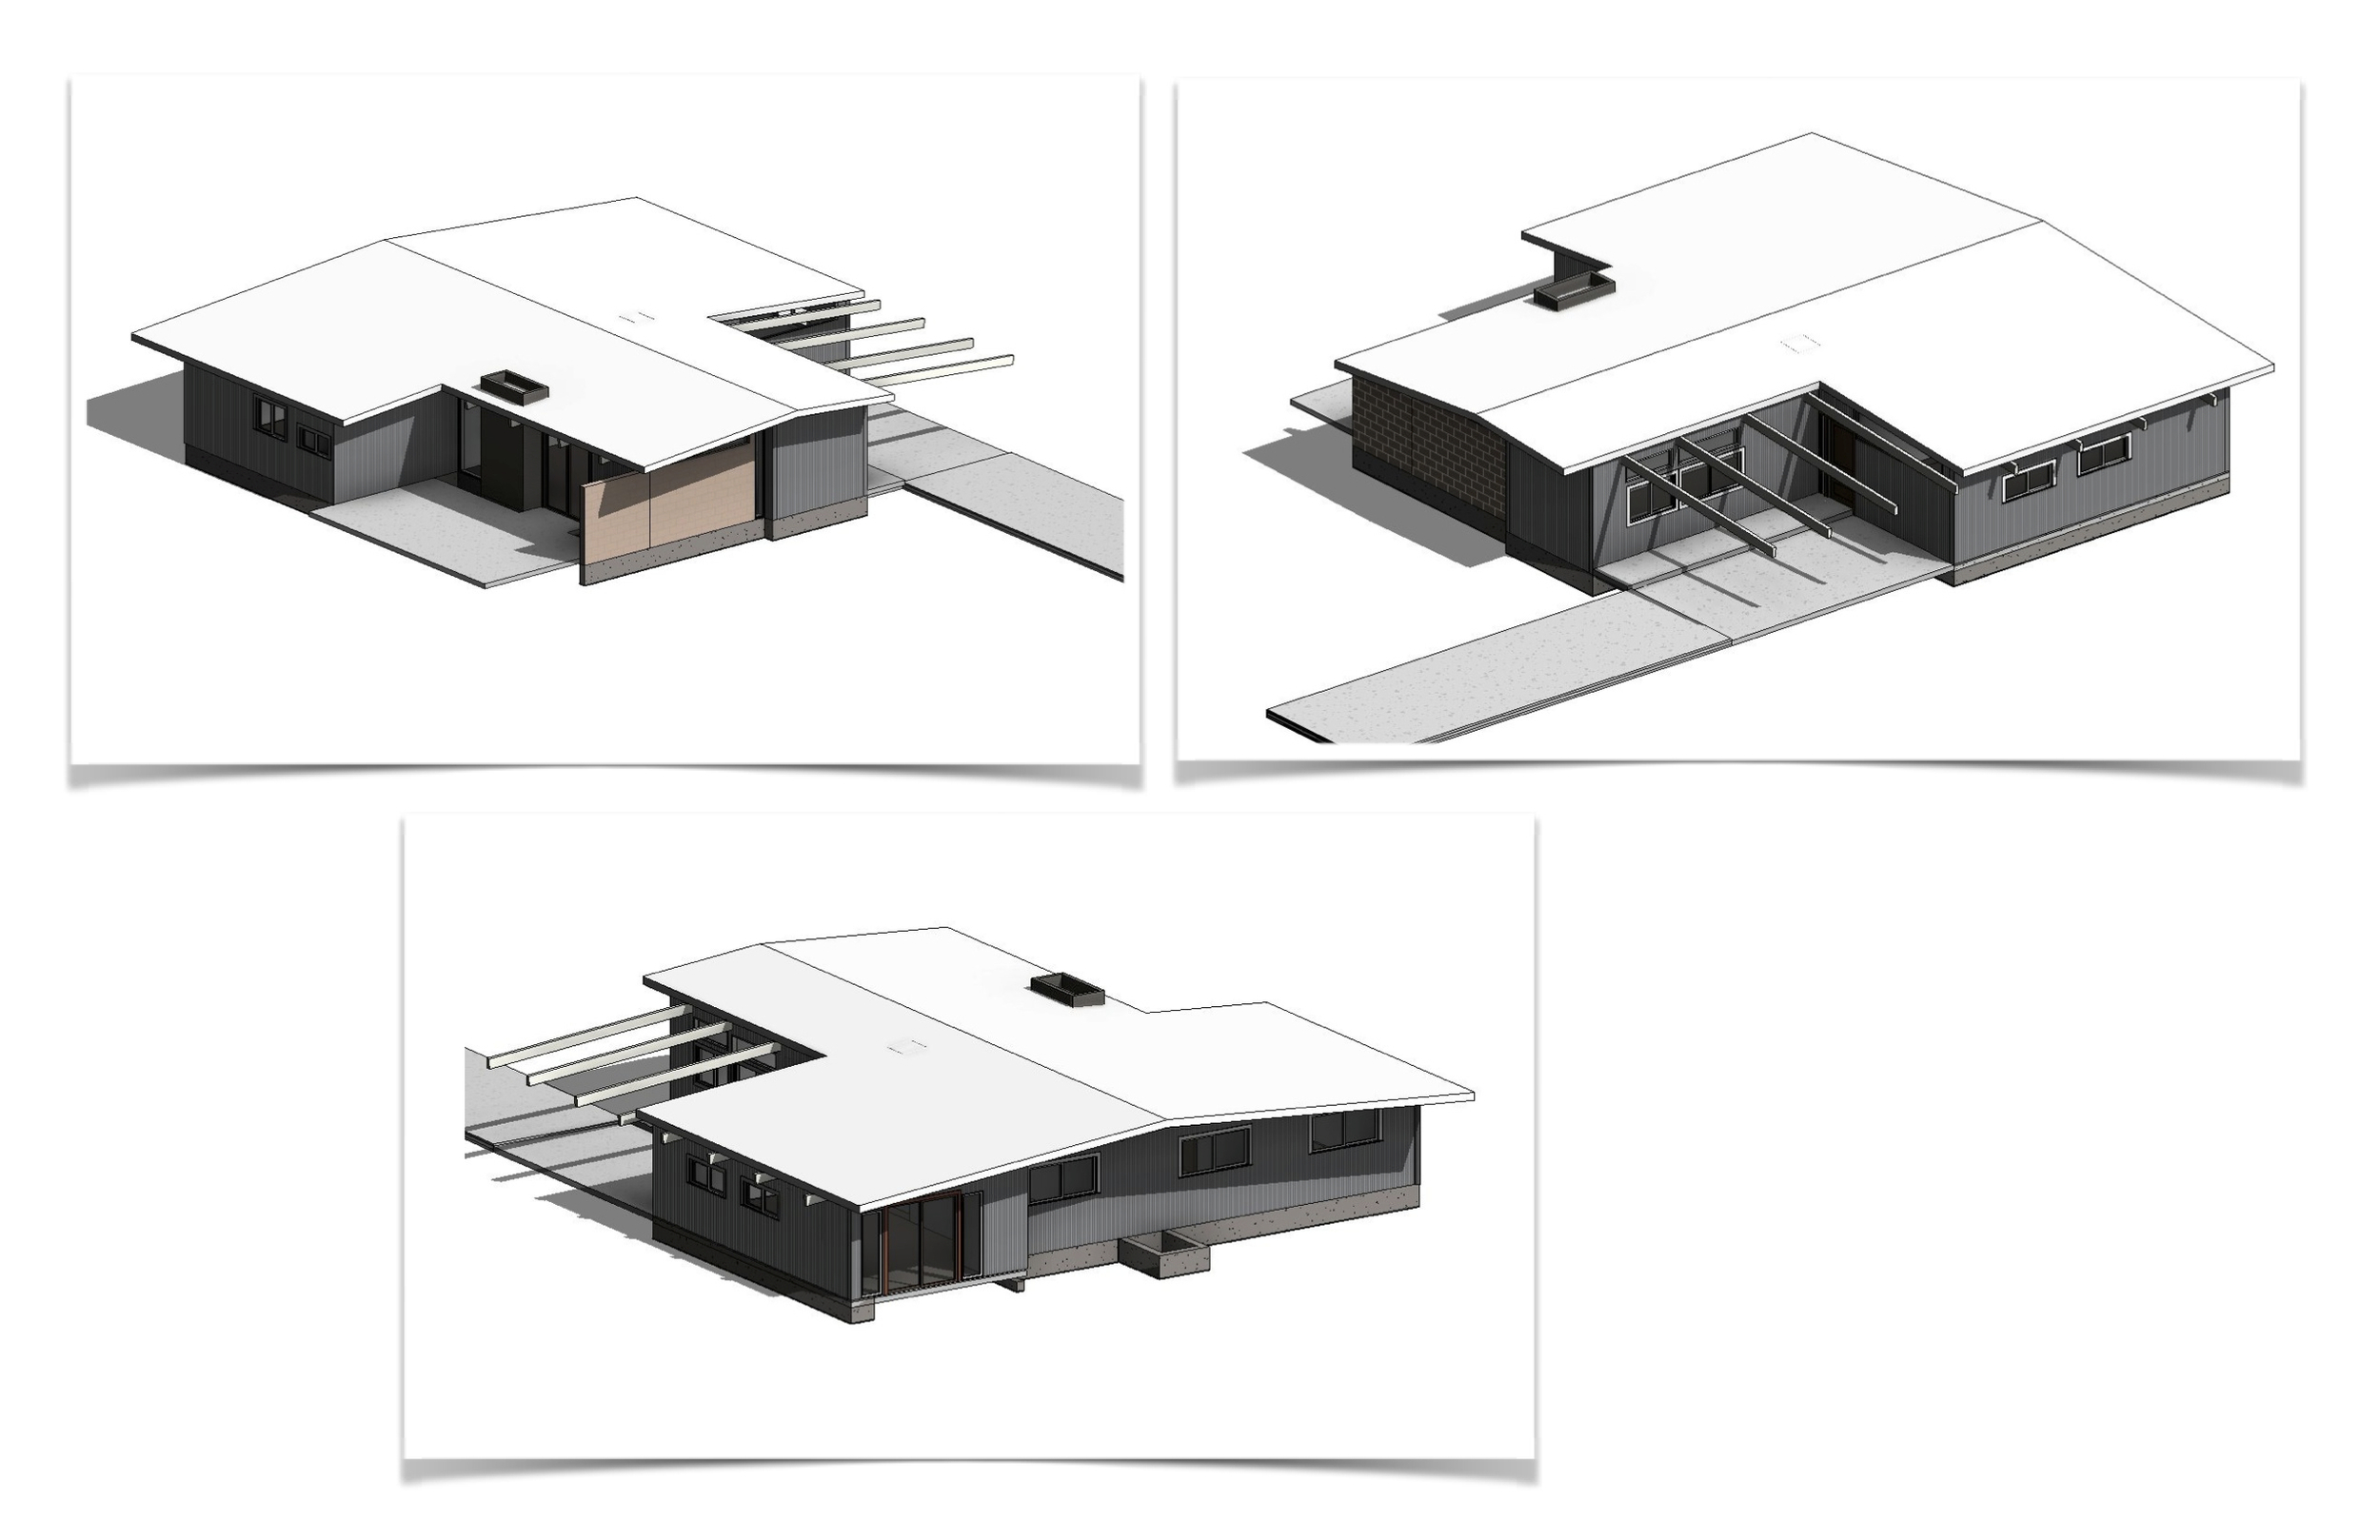 3D model views of a KP home. Credit: Angelo Marasco